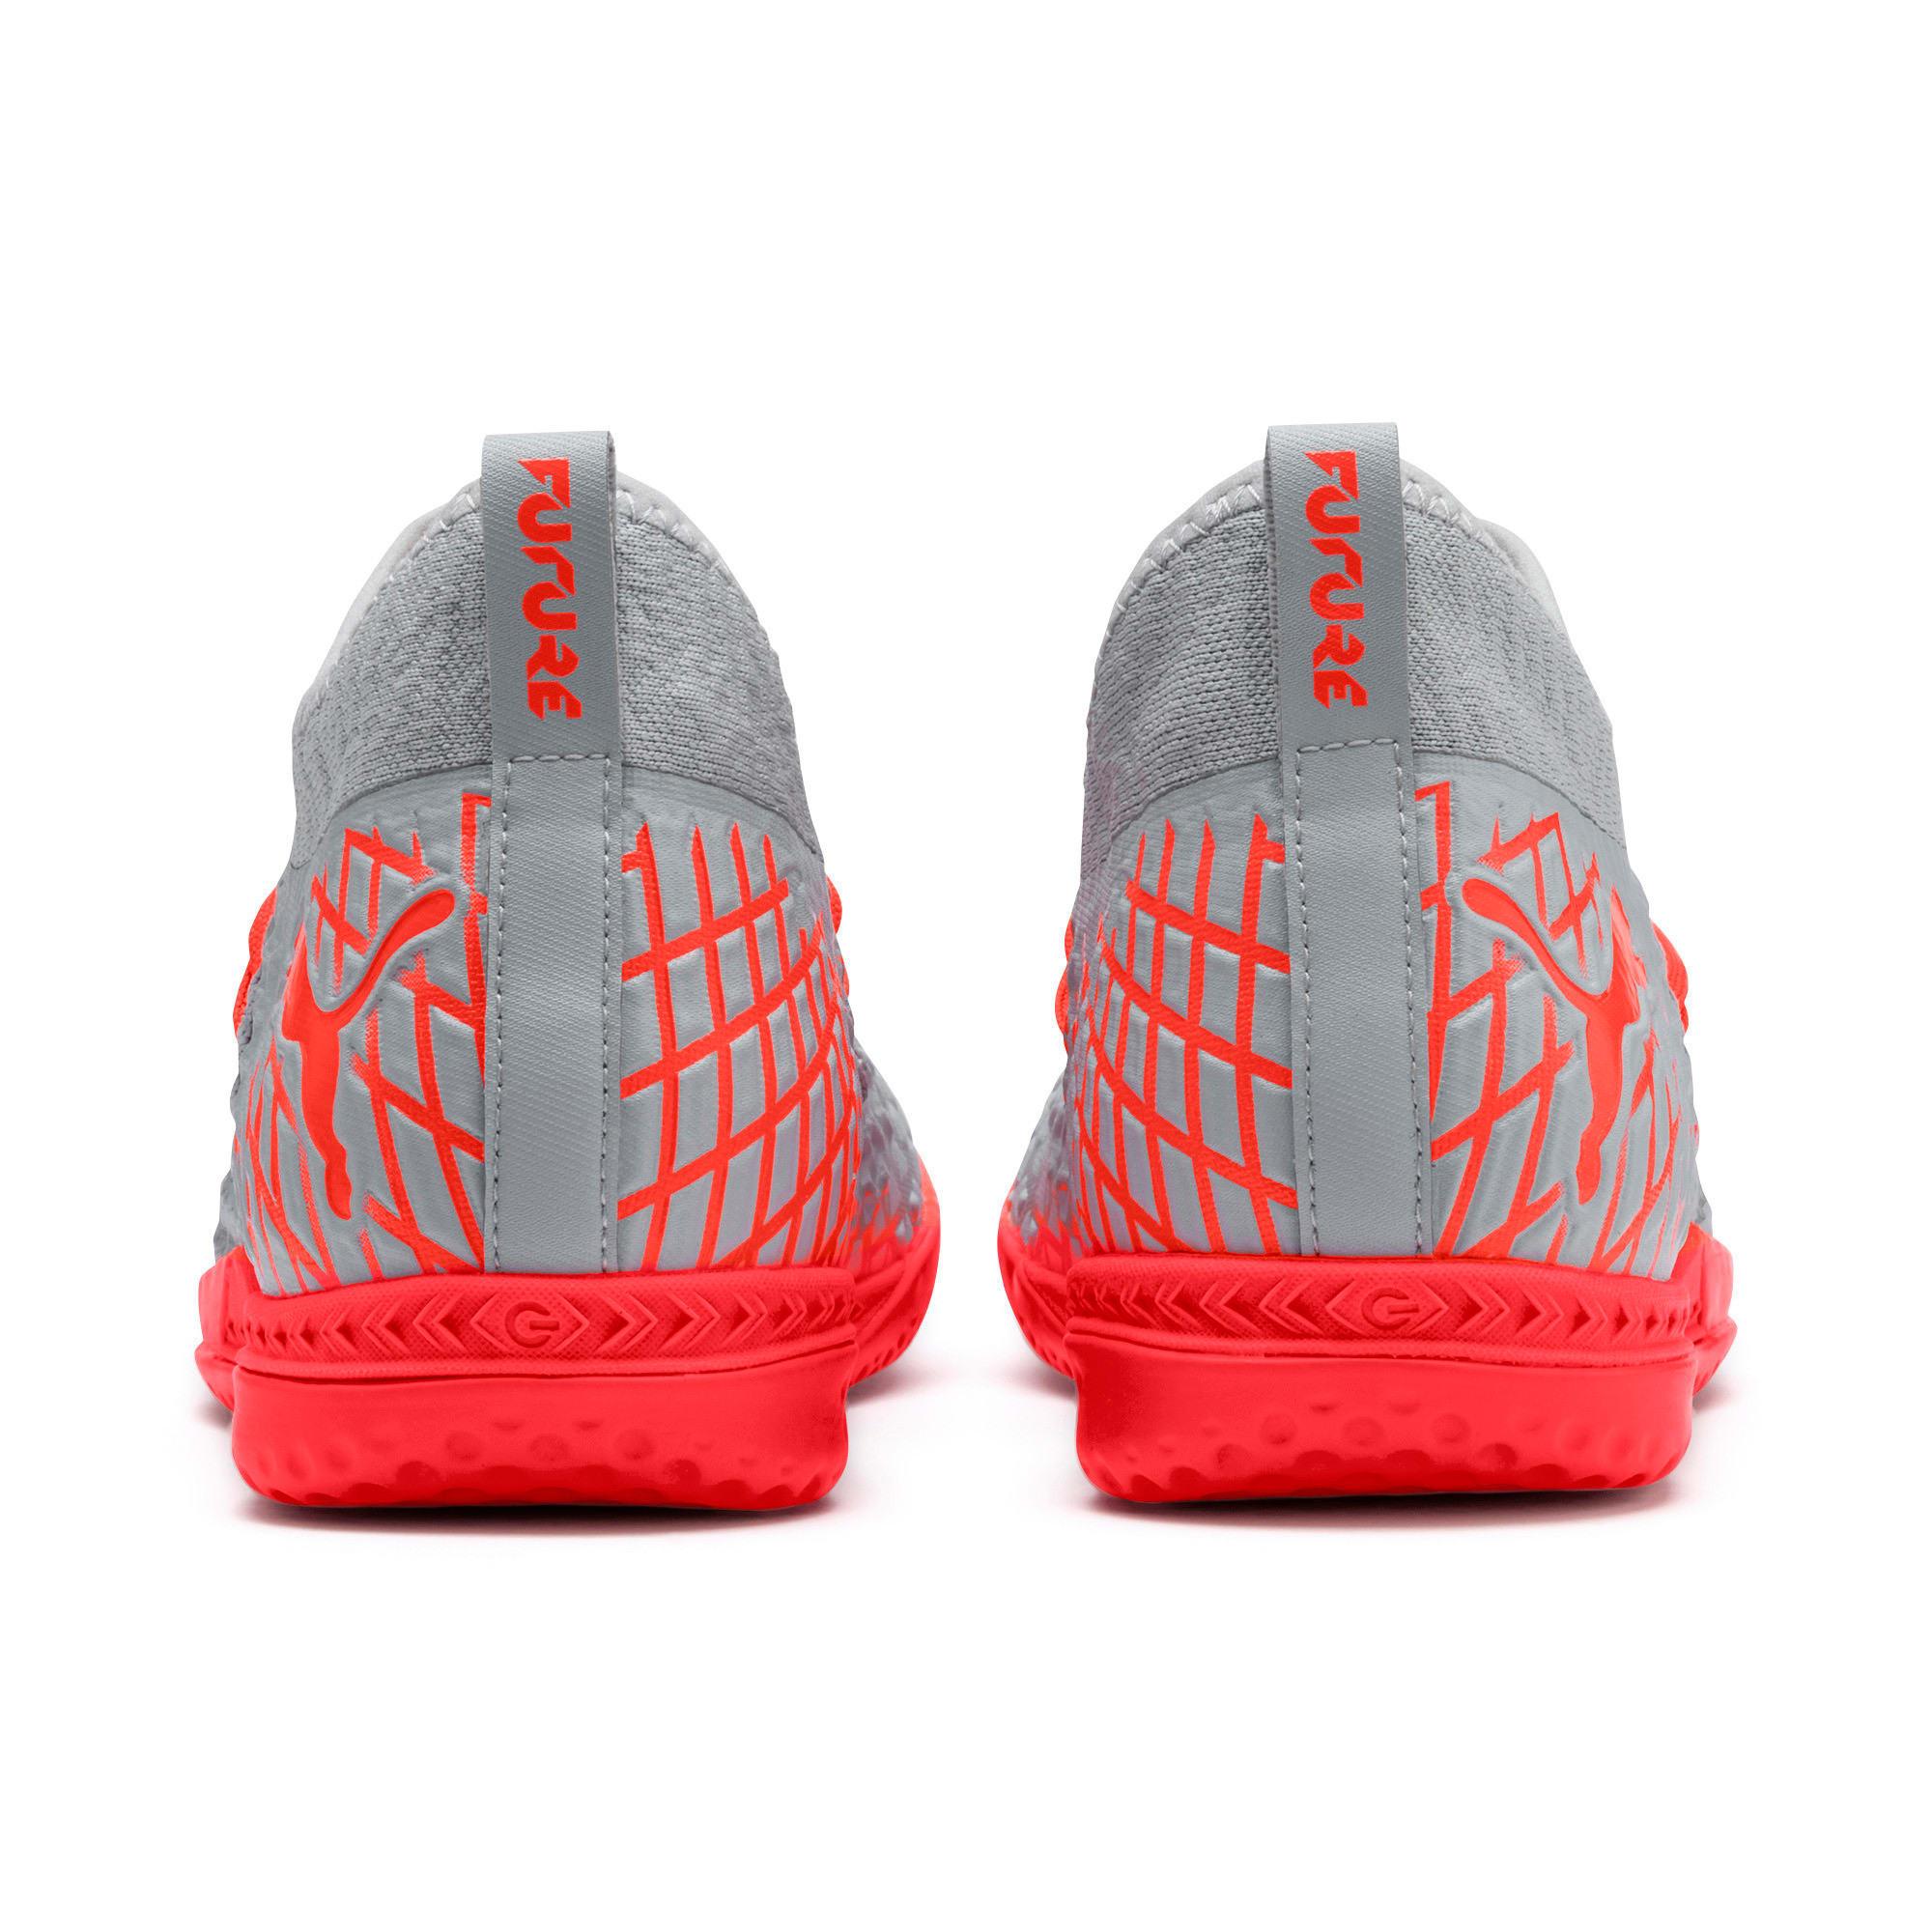 Thumbnail 4 of FUTURE 4.3 NETFIT IT Men's Soccer Shoes, Glacial Blue-Nrgy Red, medium